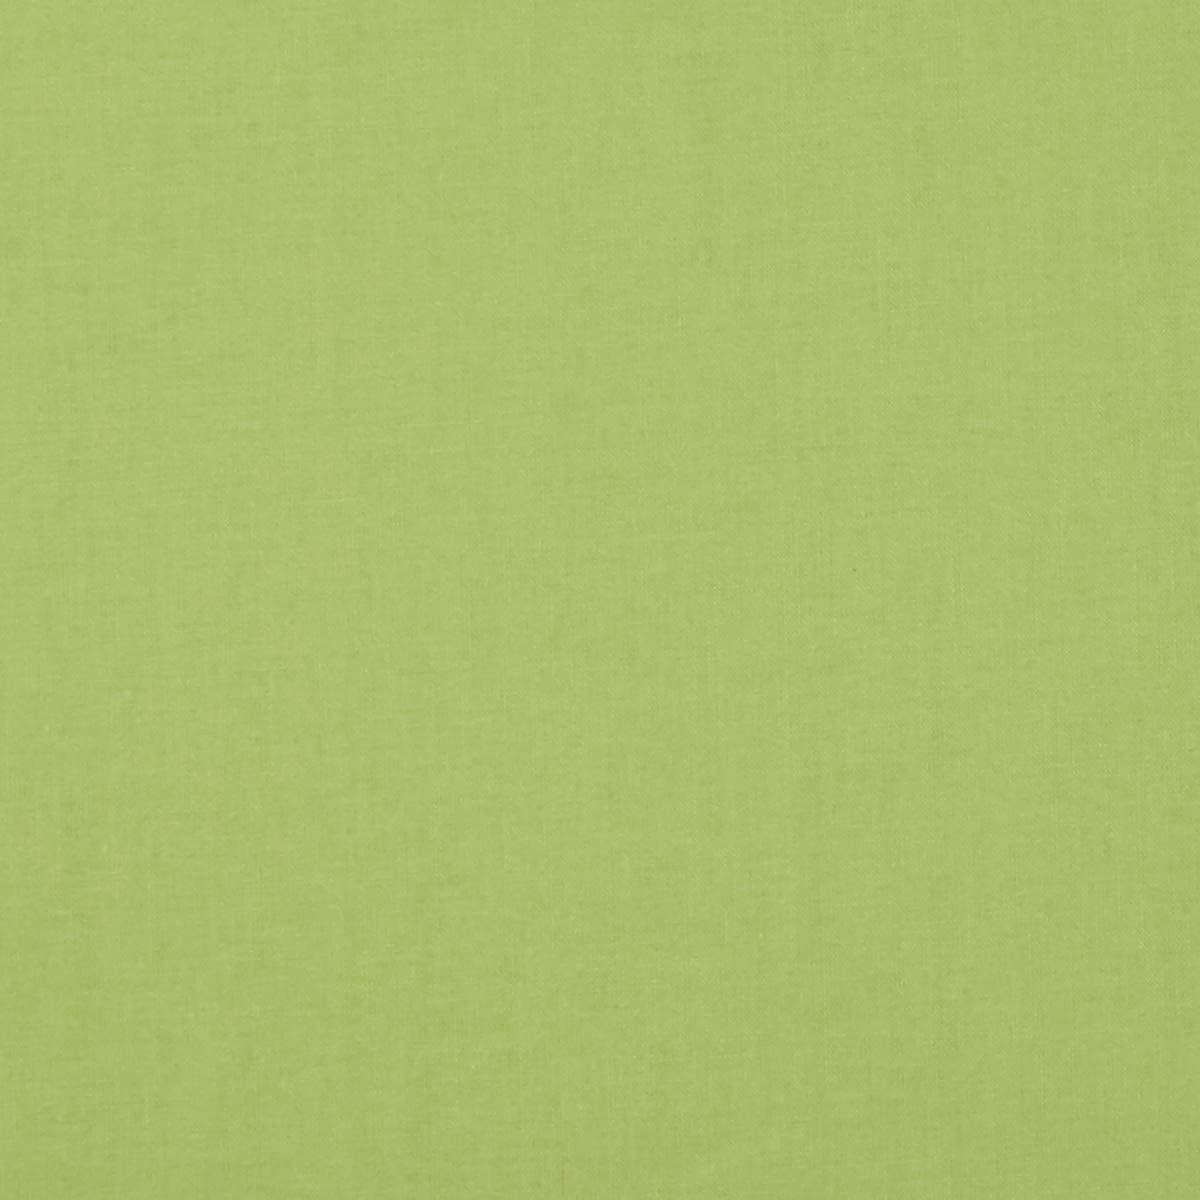 Riley Blake Designs 44'' Wide Confetti Cotton SolidSpring Green Fabric by the Yard